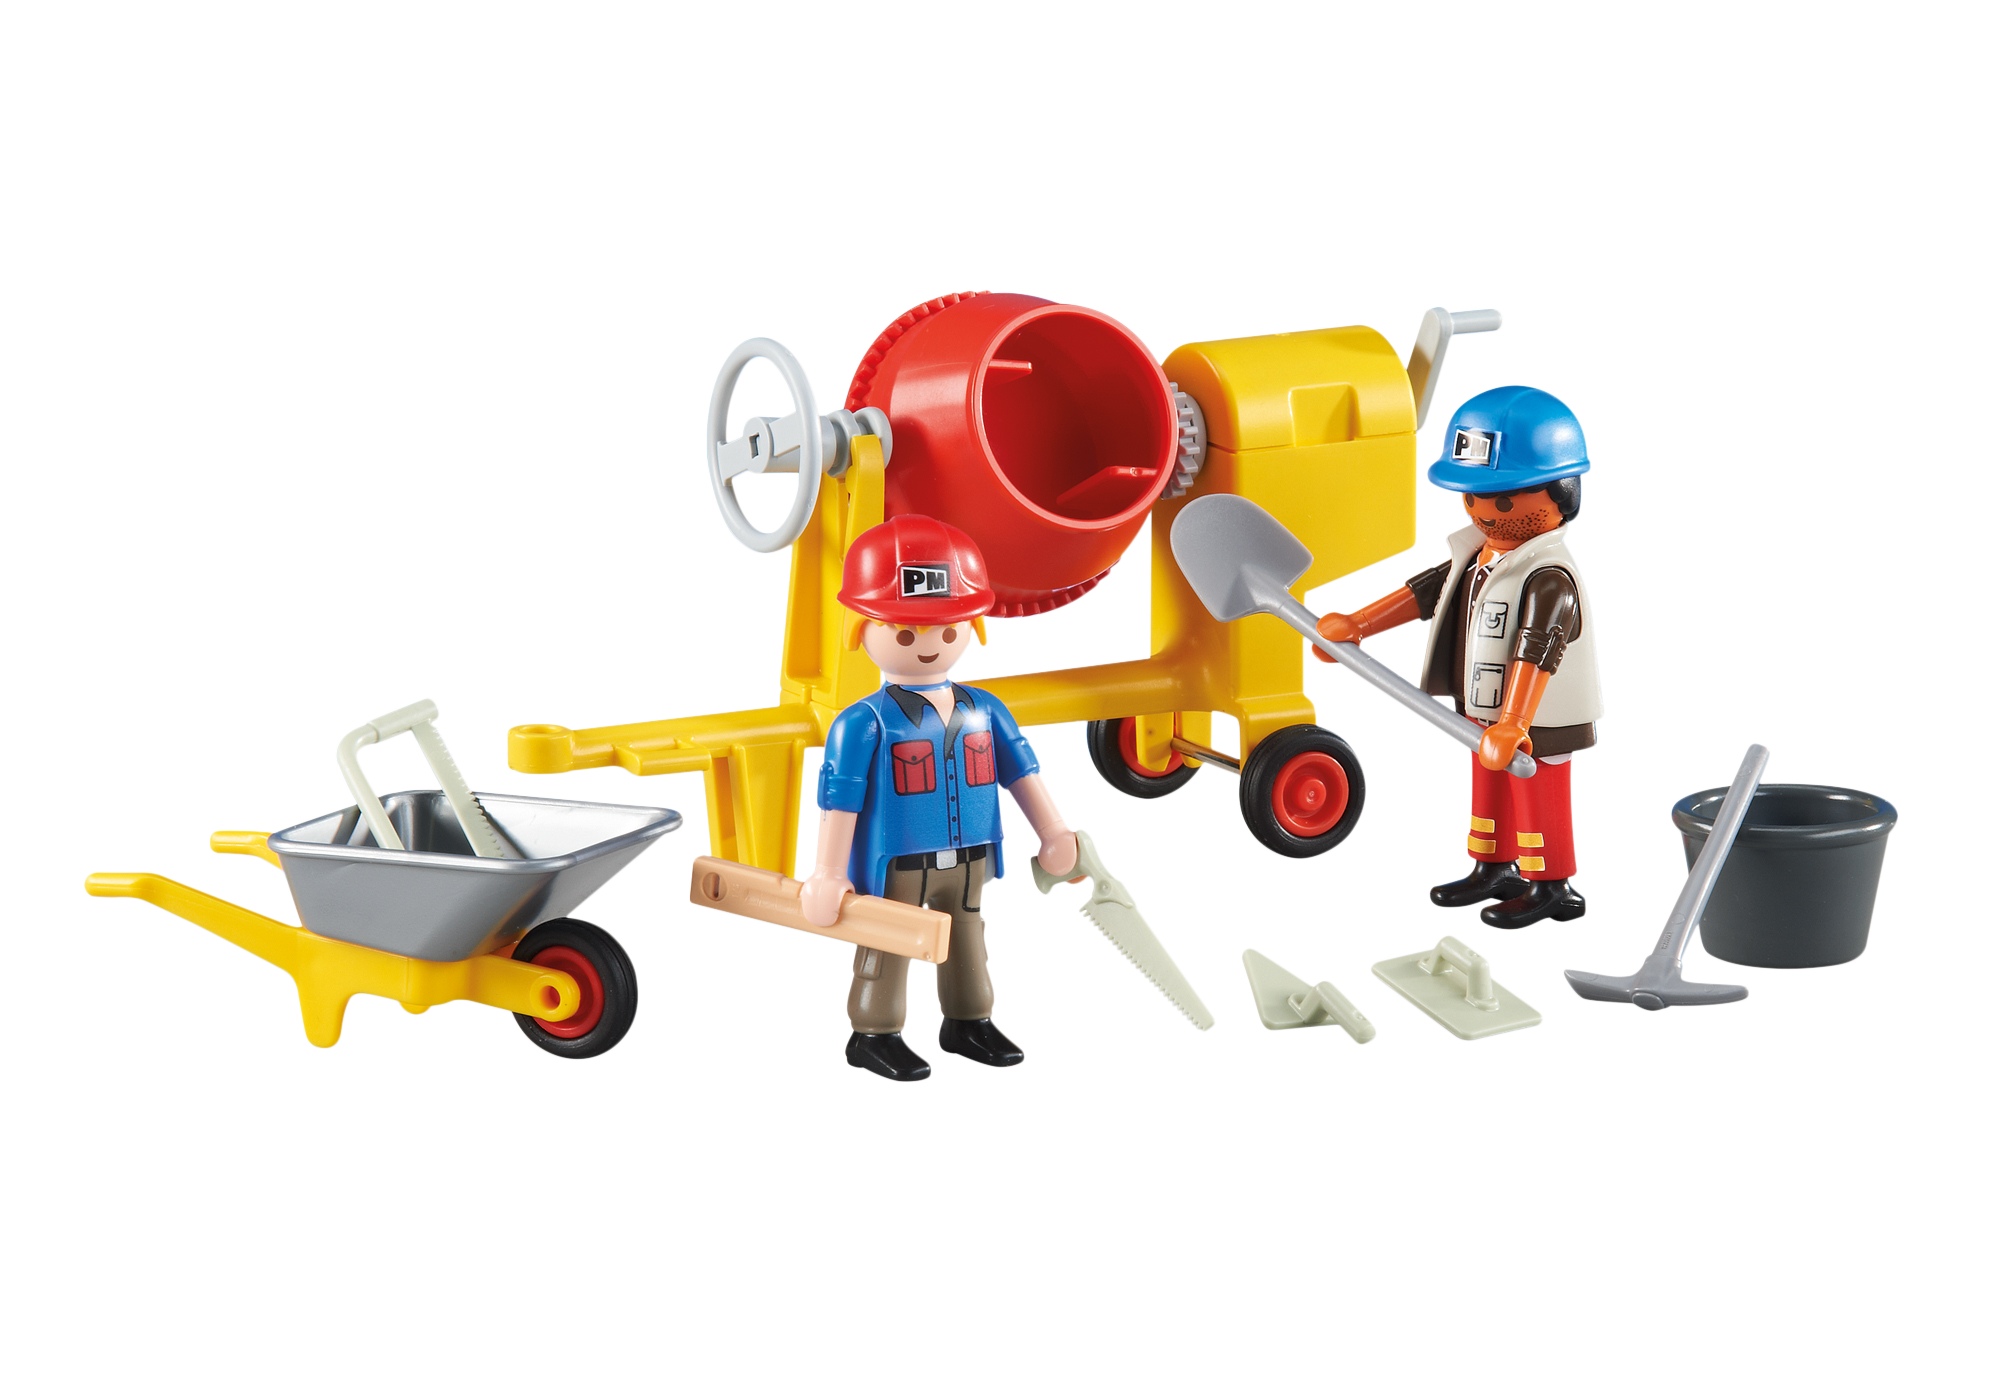 http://media.playmobil.com/i/playmobil/6339_product_detail/2 byggarbetare